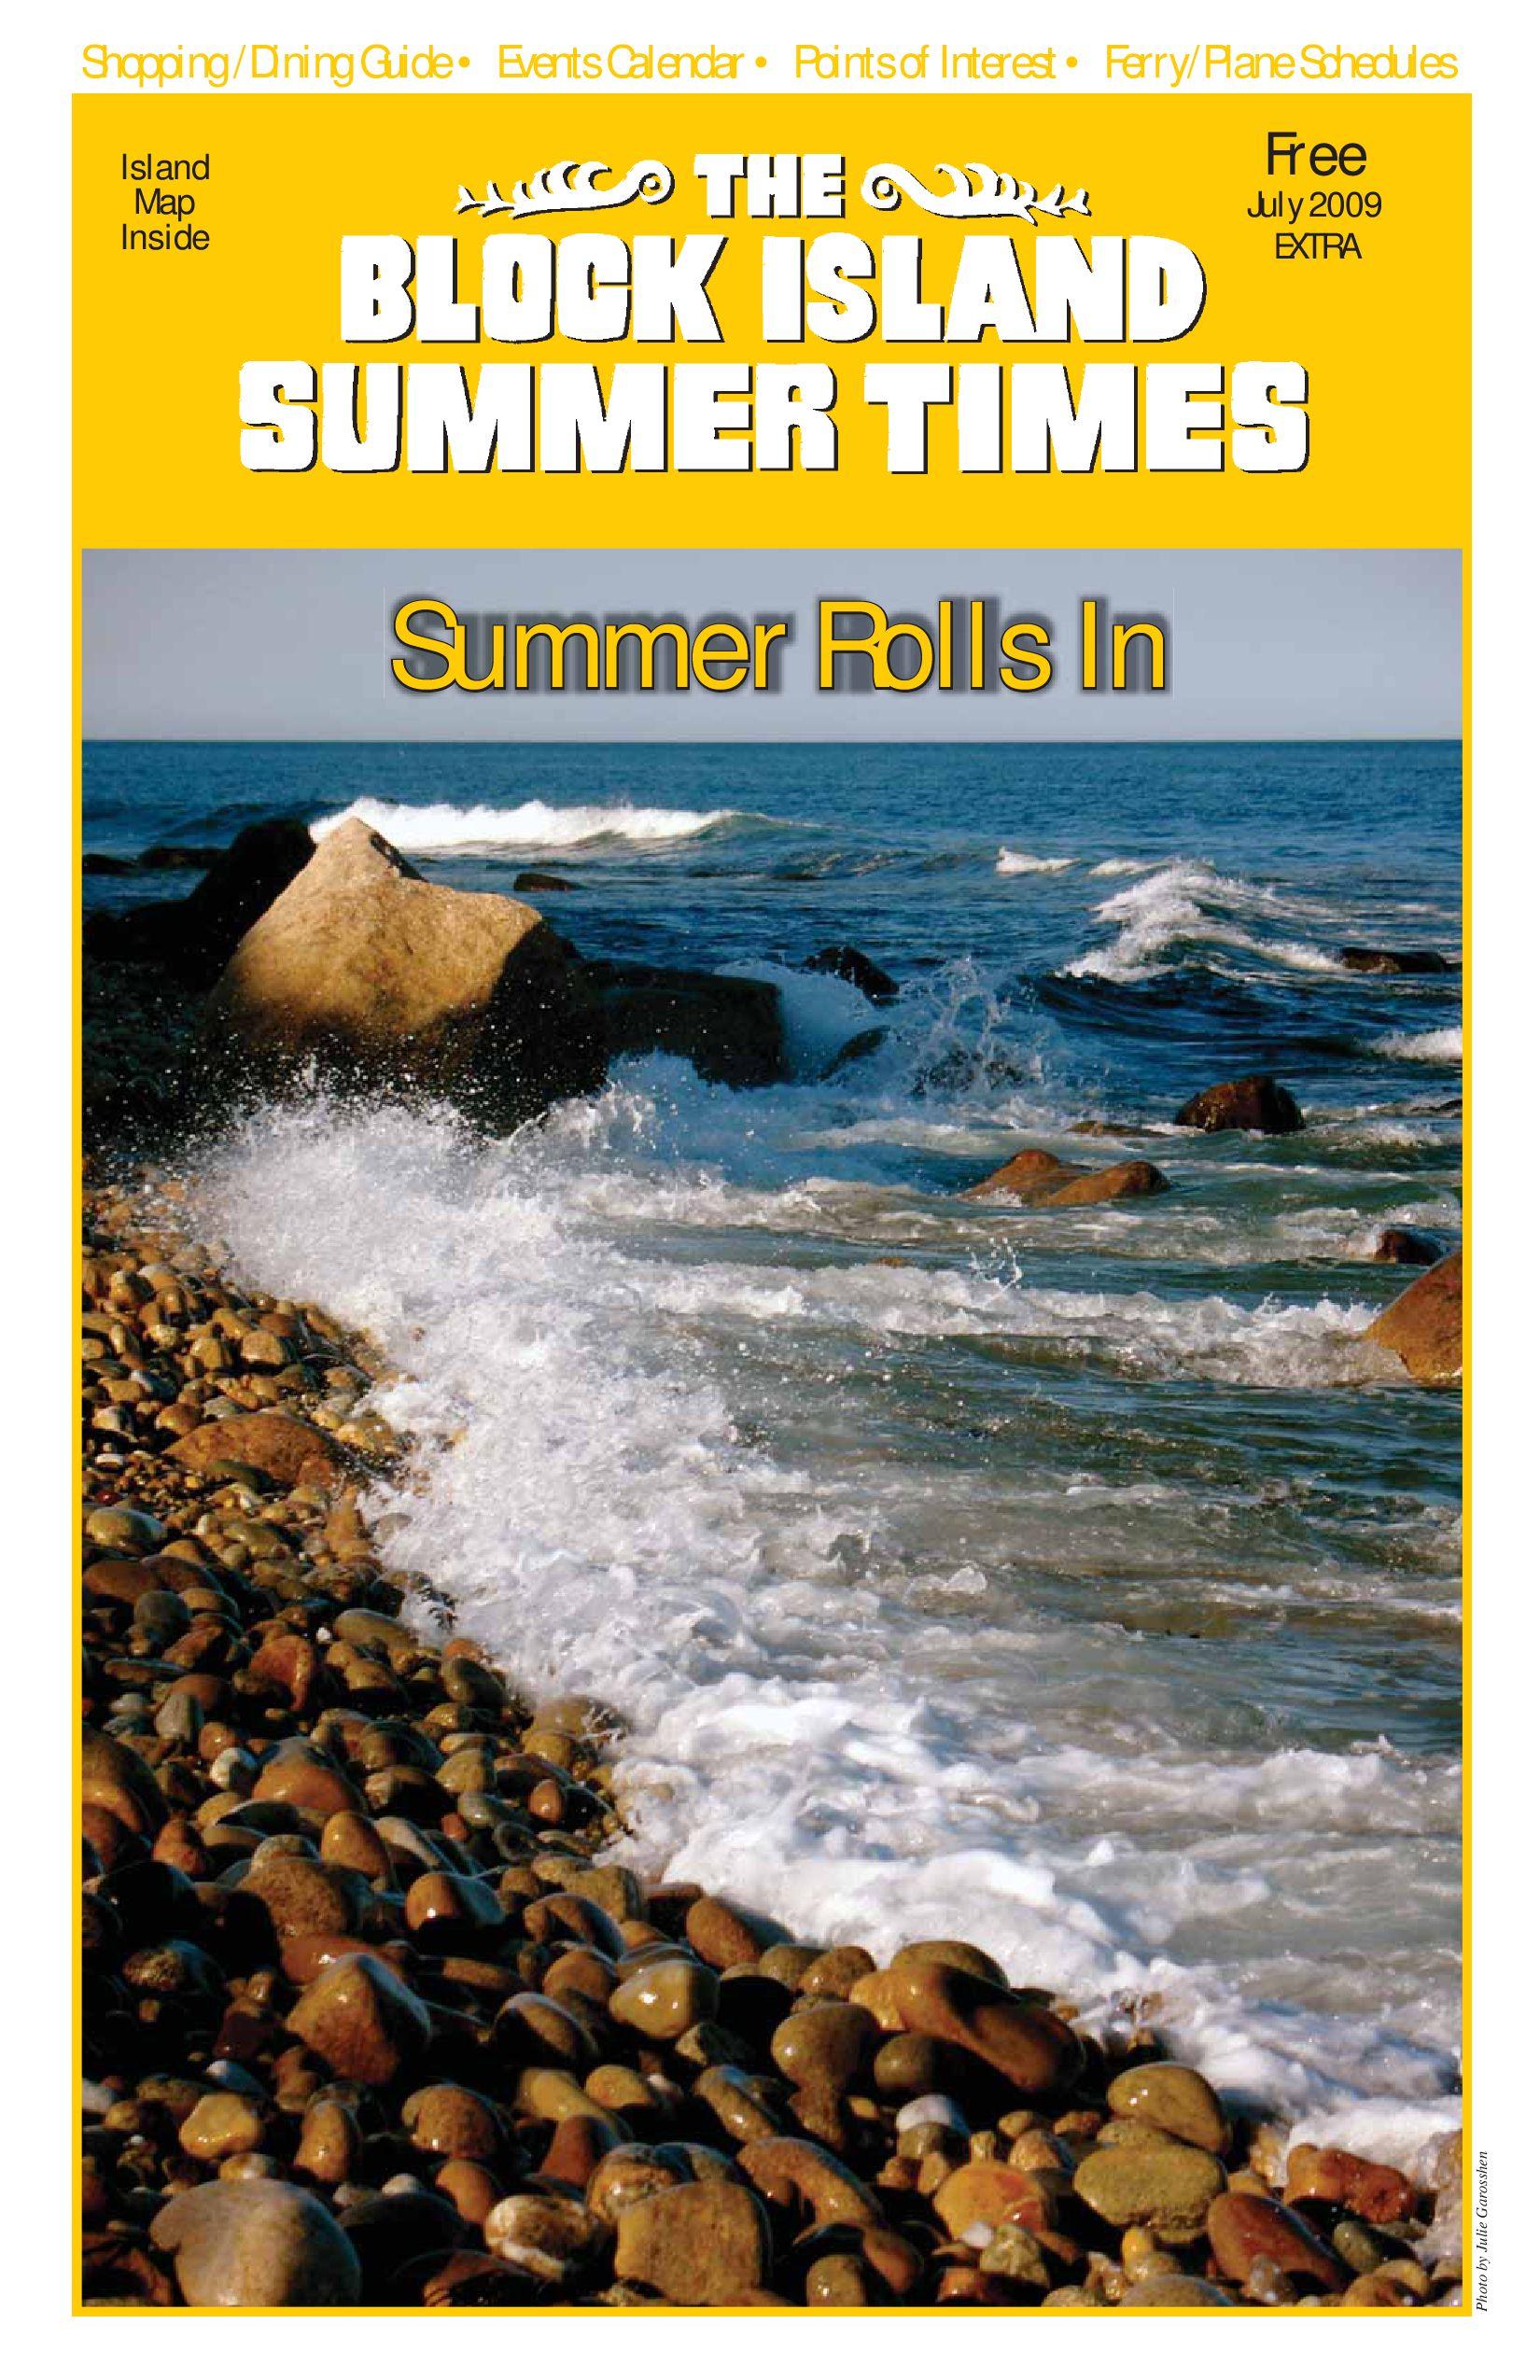 Block island summer times july 2009 by chris barrett issuu geenschuldenfo Gallery